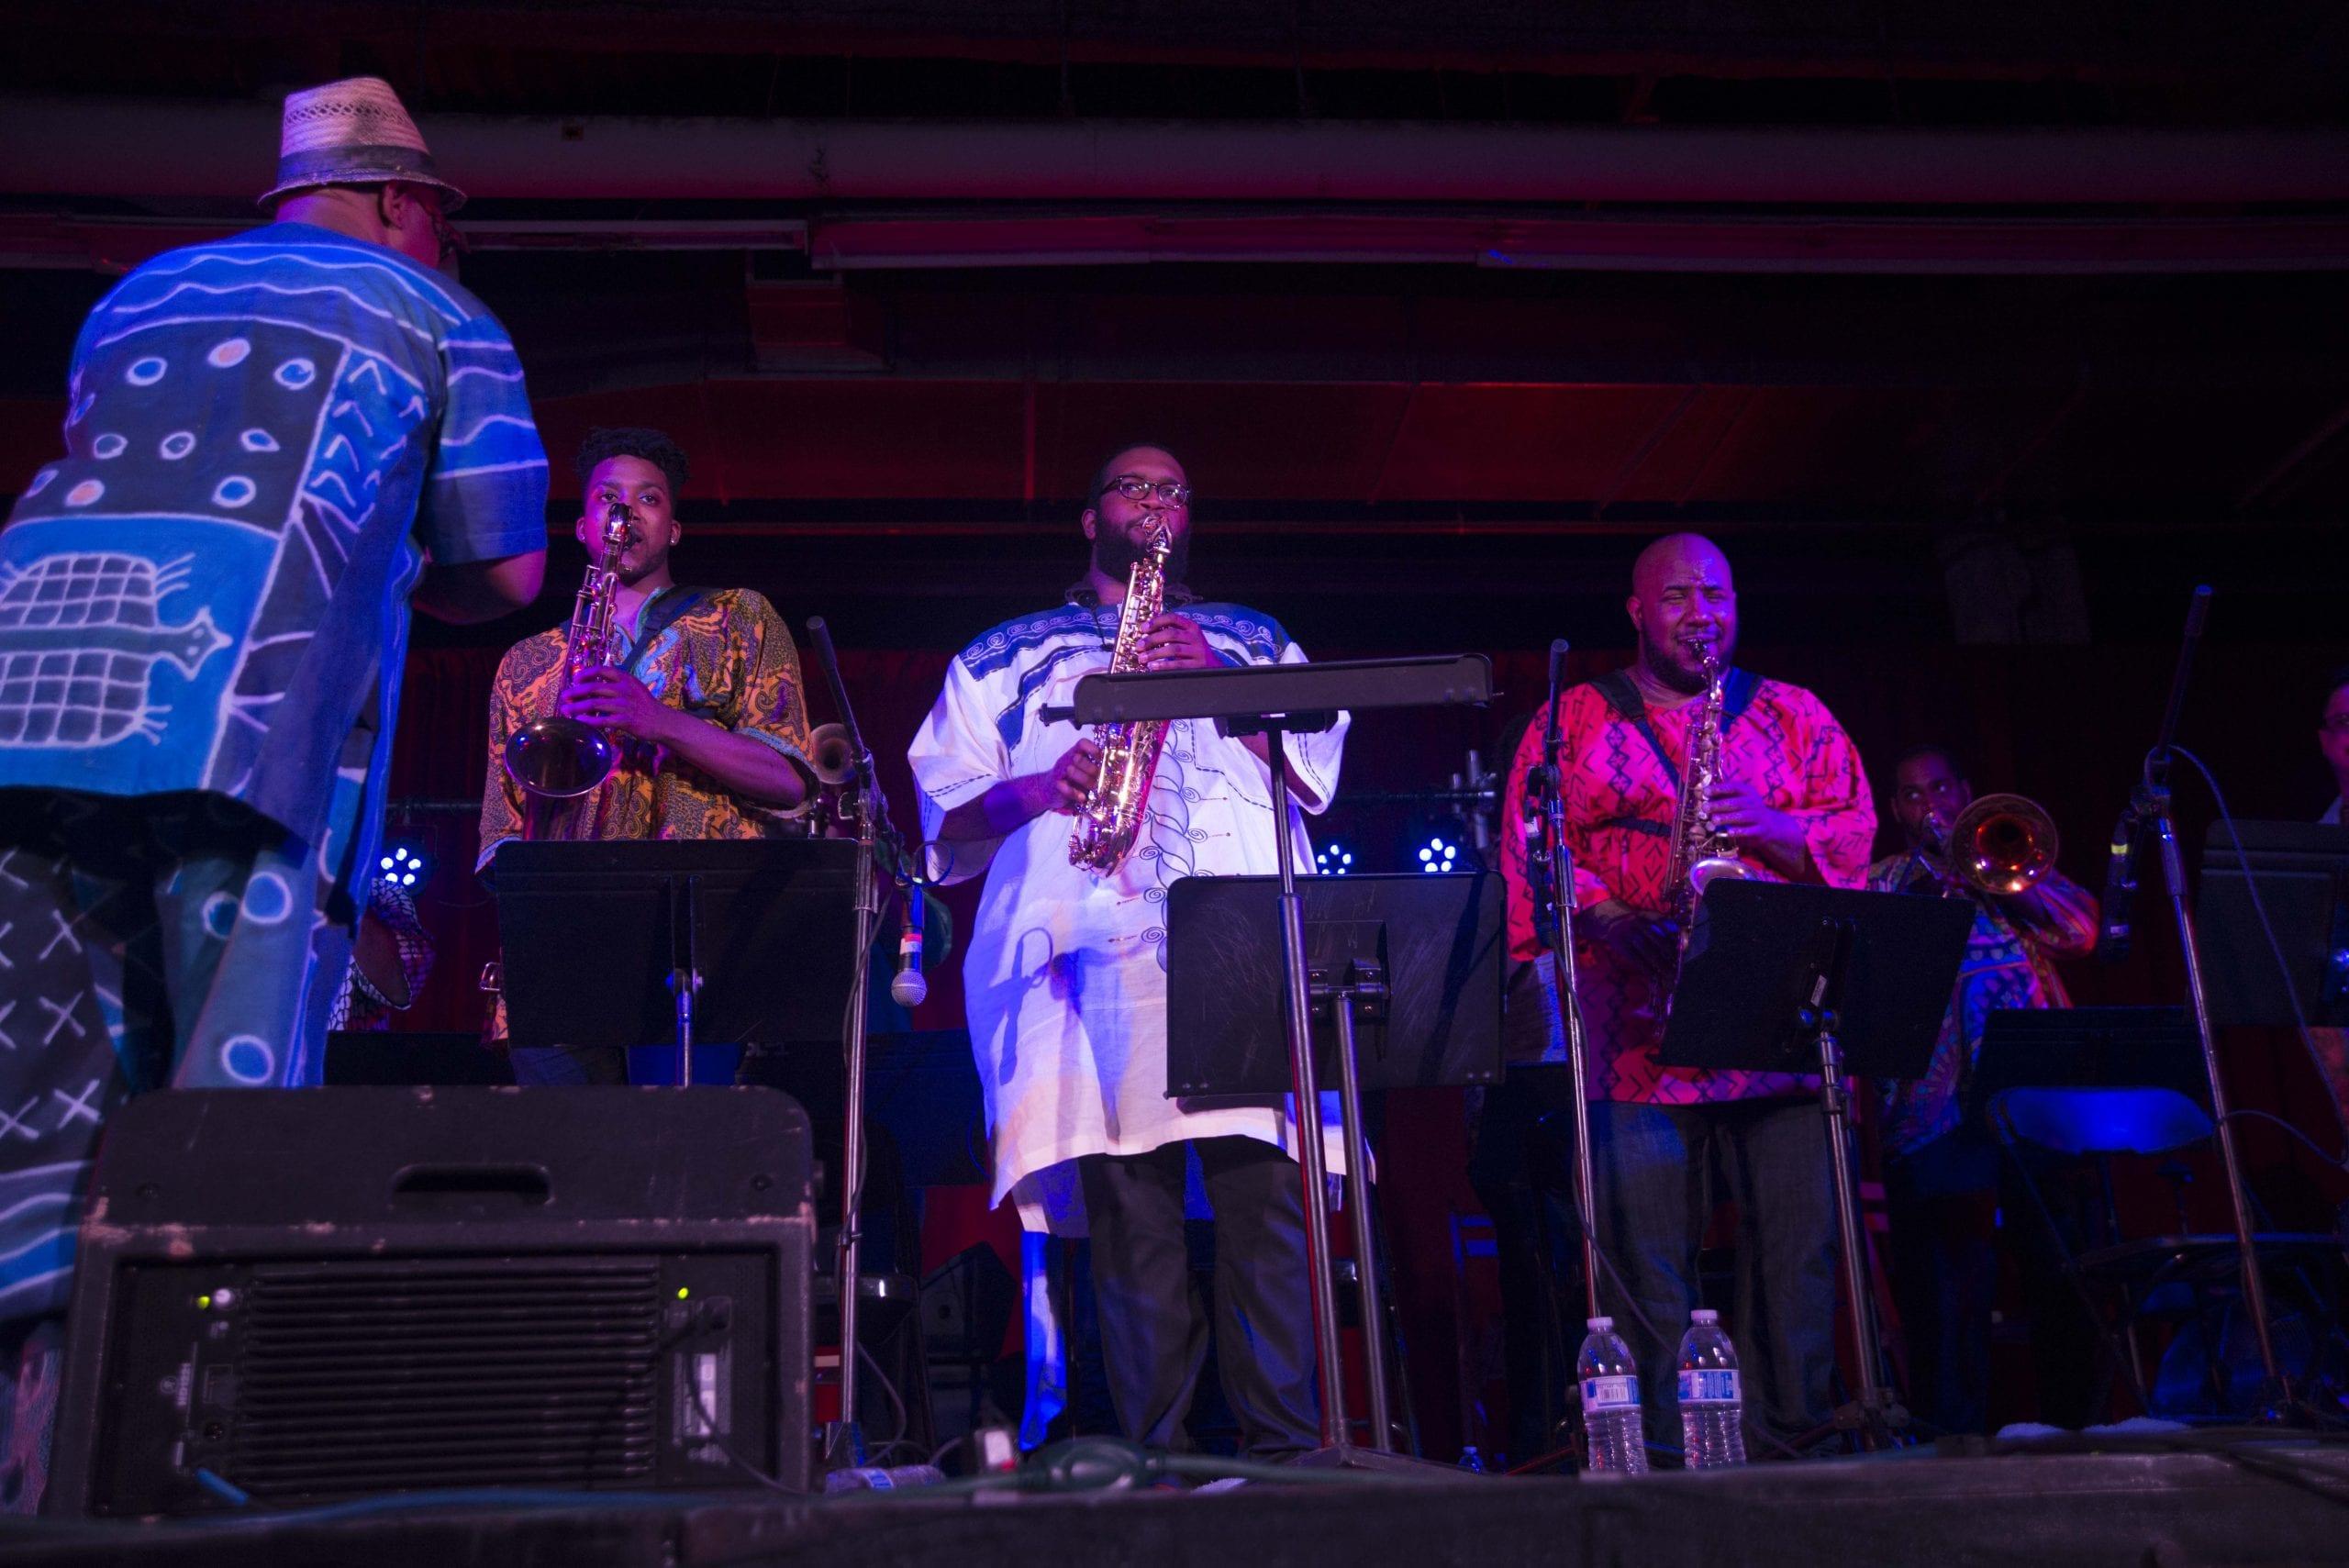 Ernest Dawkins' Live the Spirit Big Band